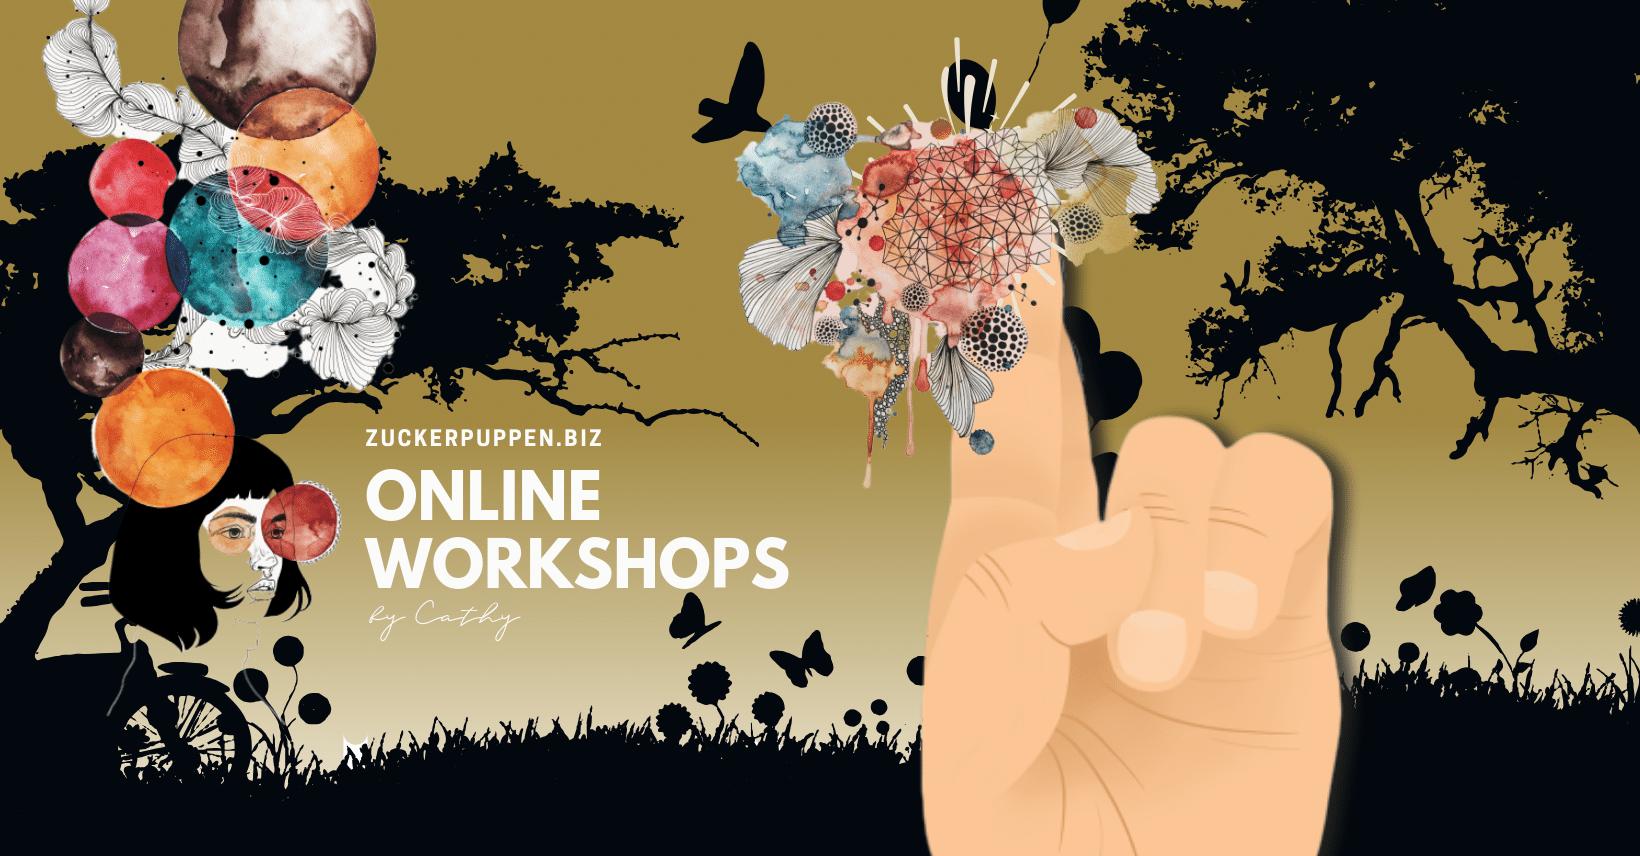 Zuckerpuppen.biz Online Workshops.png